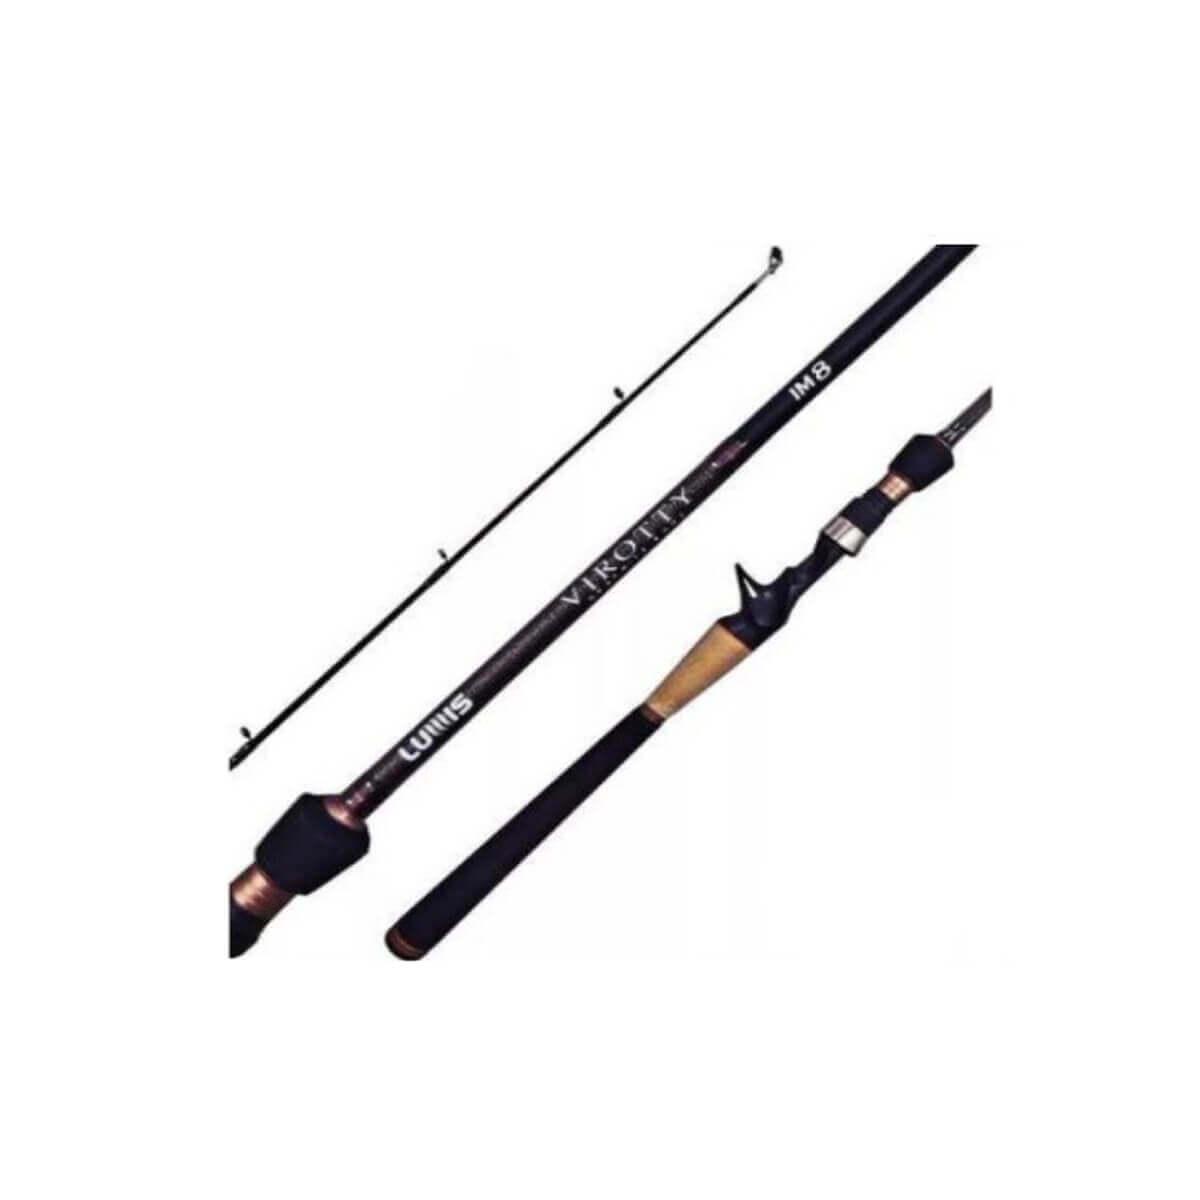 Vara Lumis Virotty p/ Carretilha 2,40 m 50 lbs (2 partes)  - Pró Pesca Shop